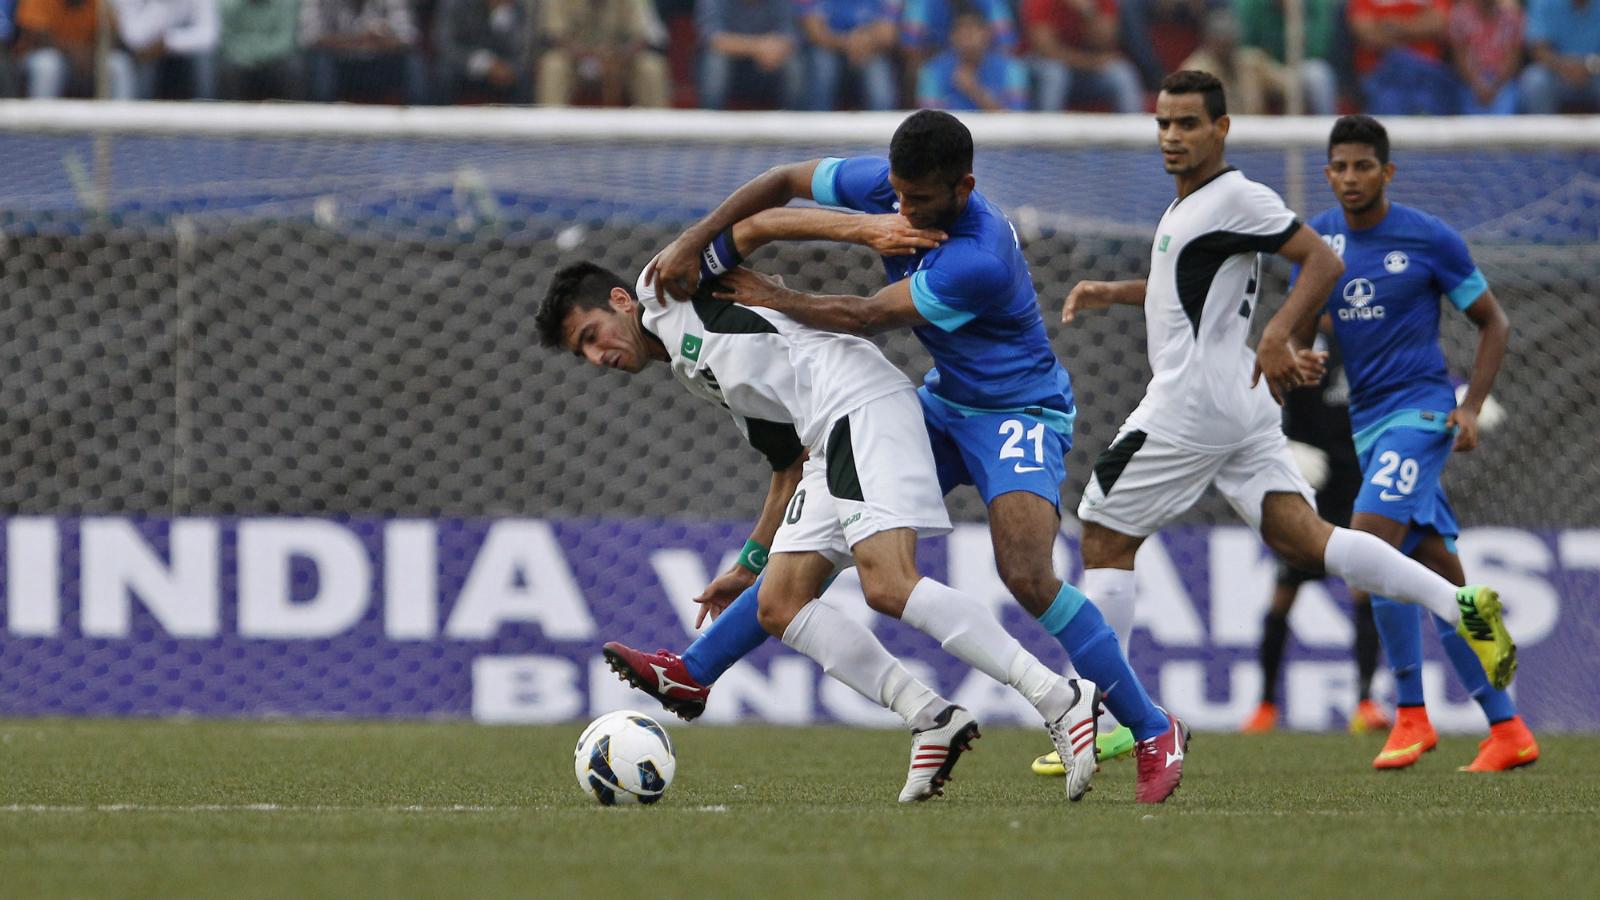 India-SOccer-Football